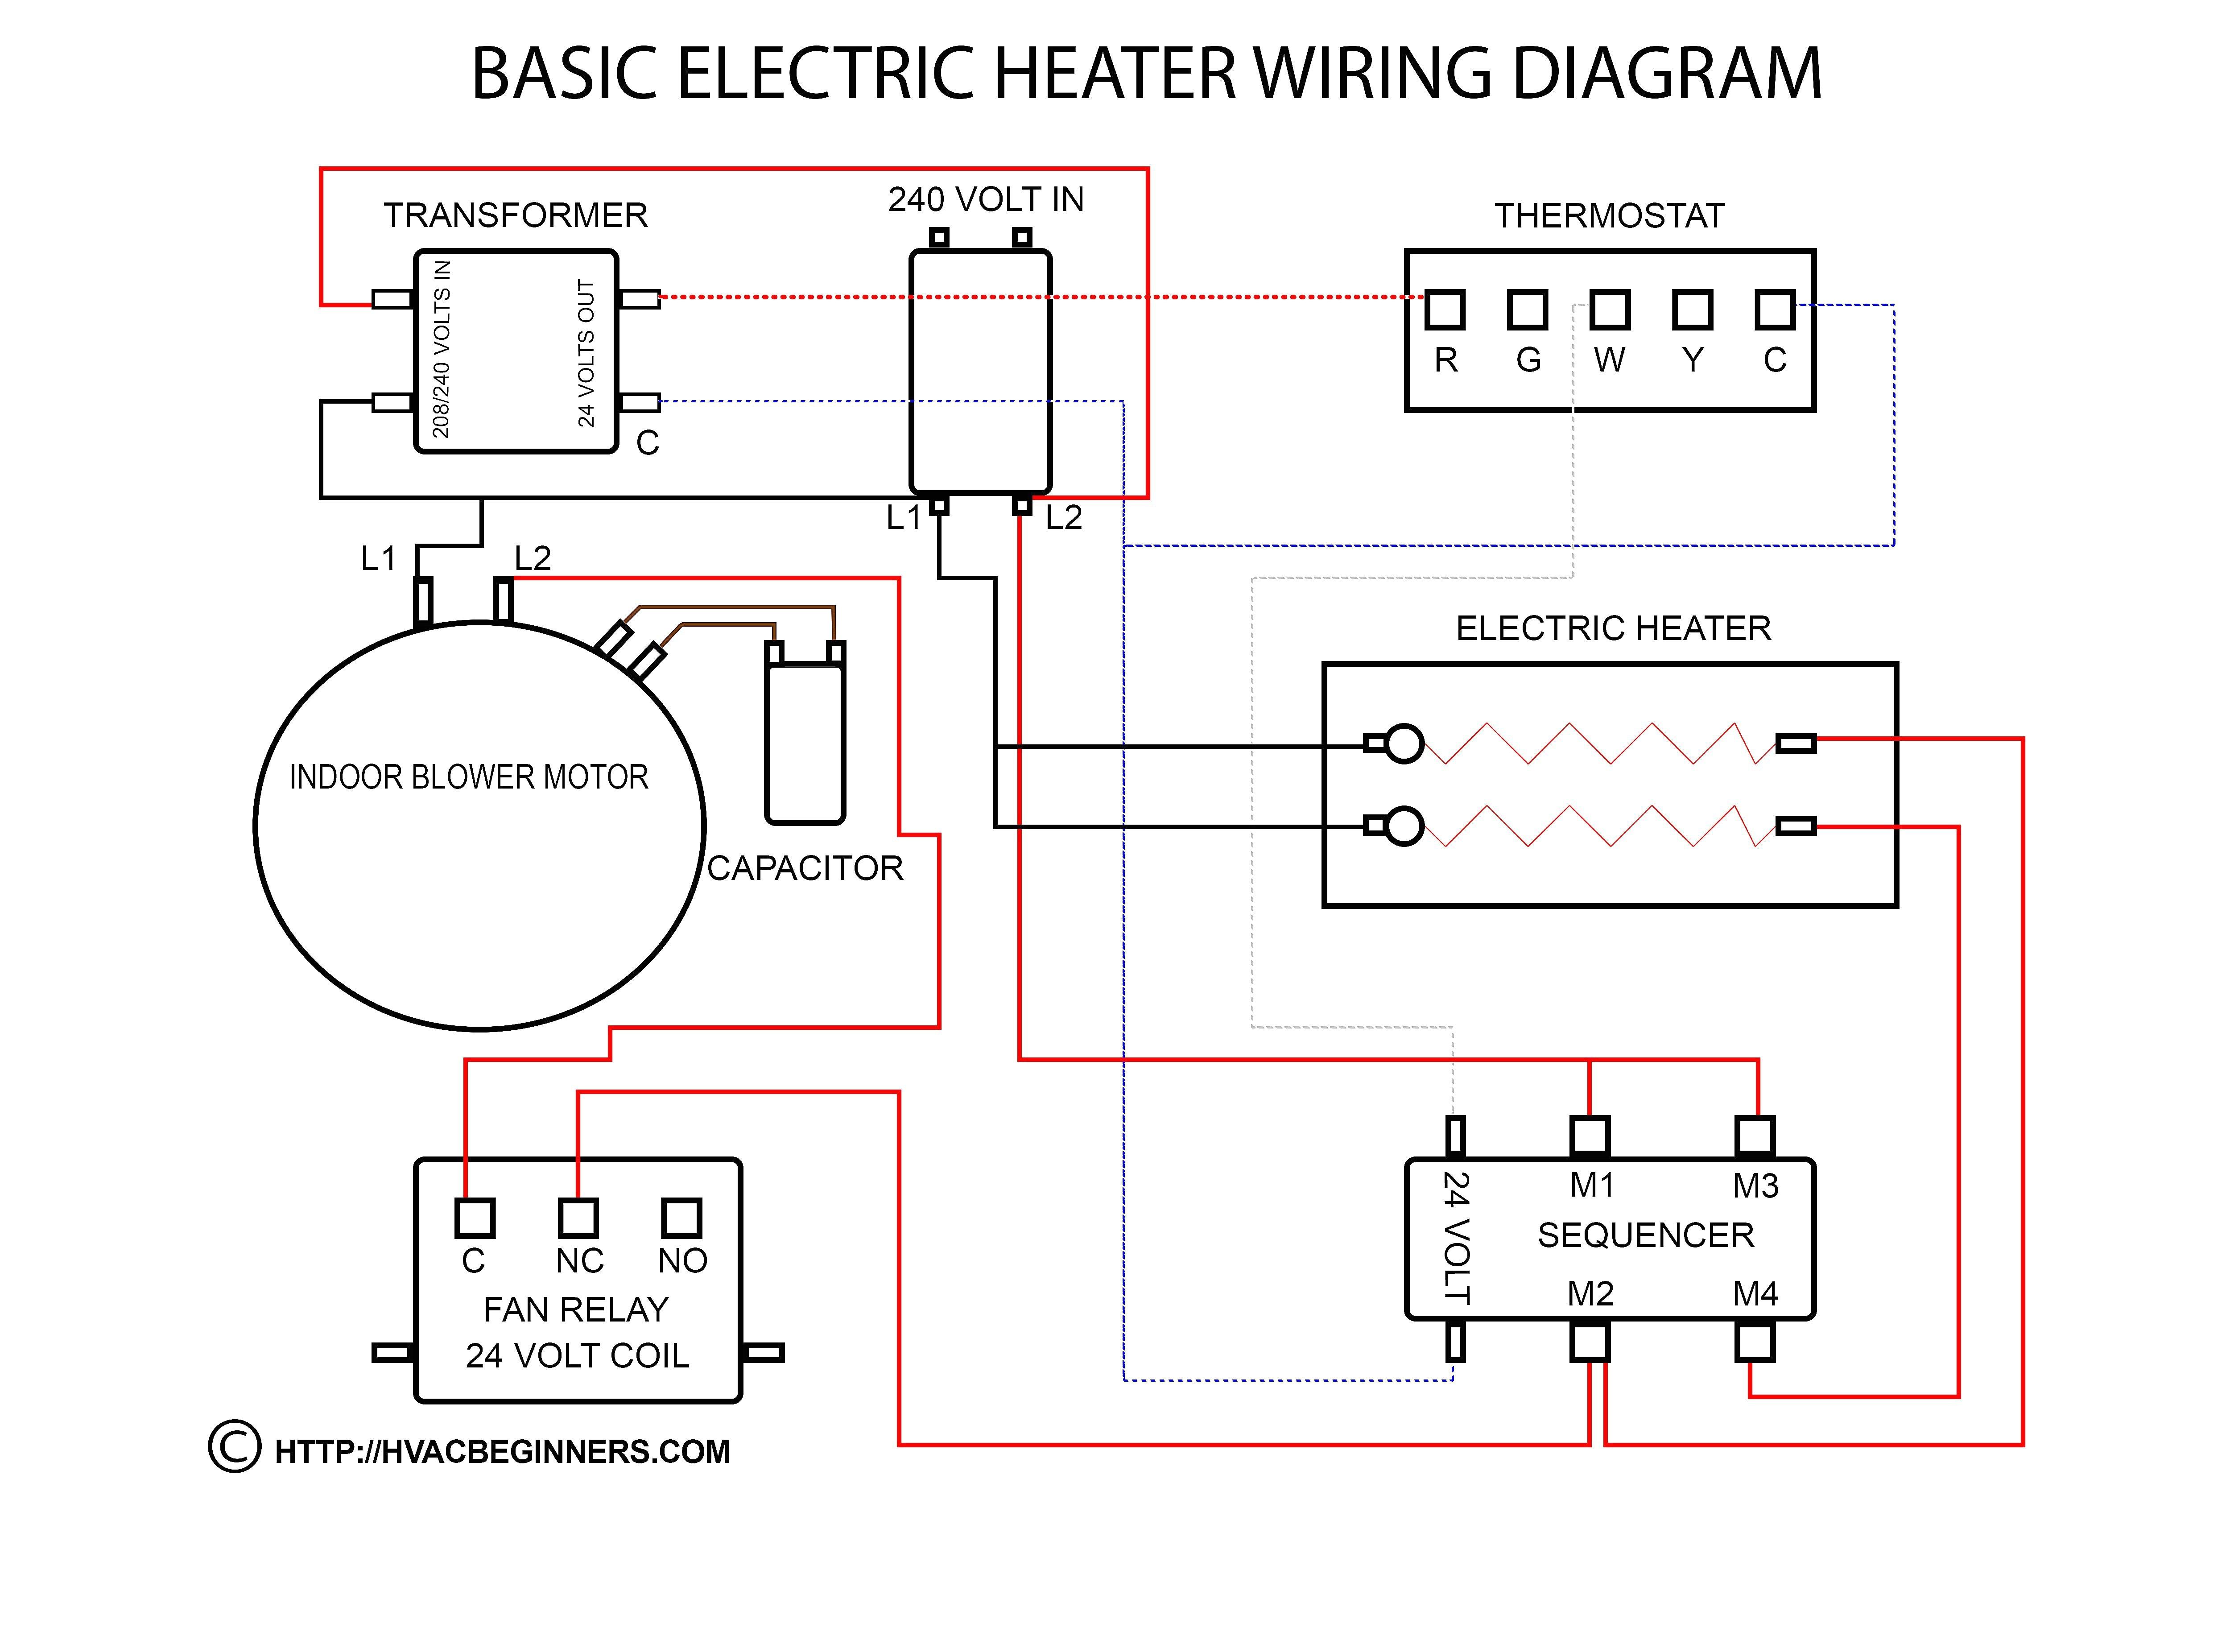 thermostat wiring furthermore bryant heat pump thermostat wiring wiring diagram for goodman heat pump moreover lennox thermostat wiring